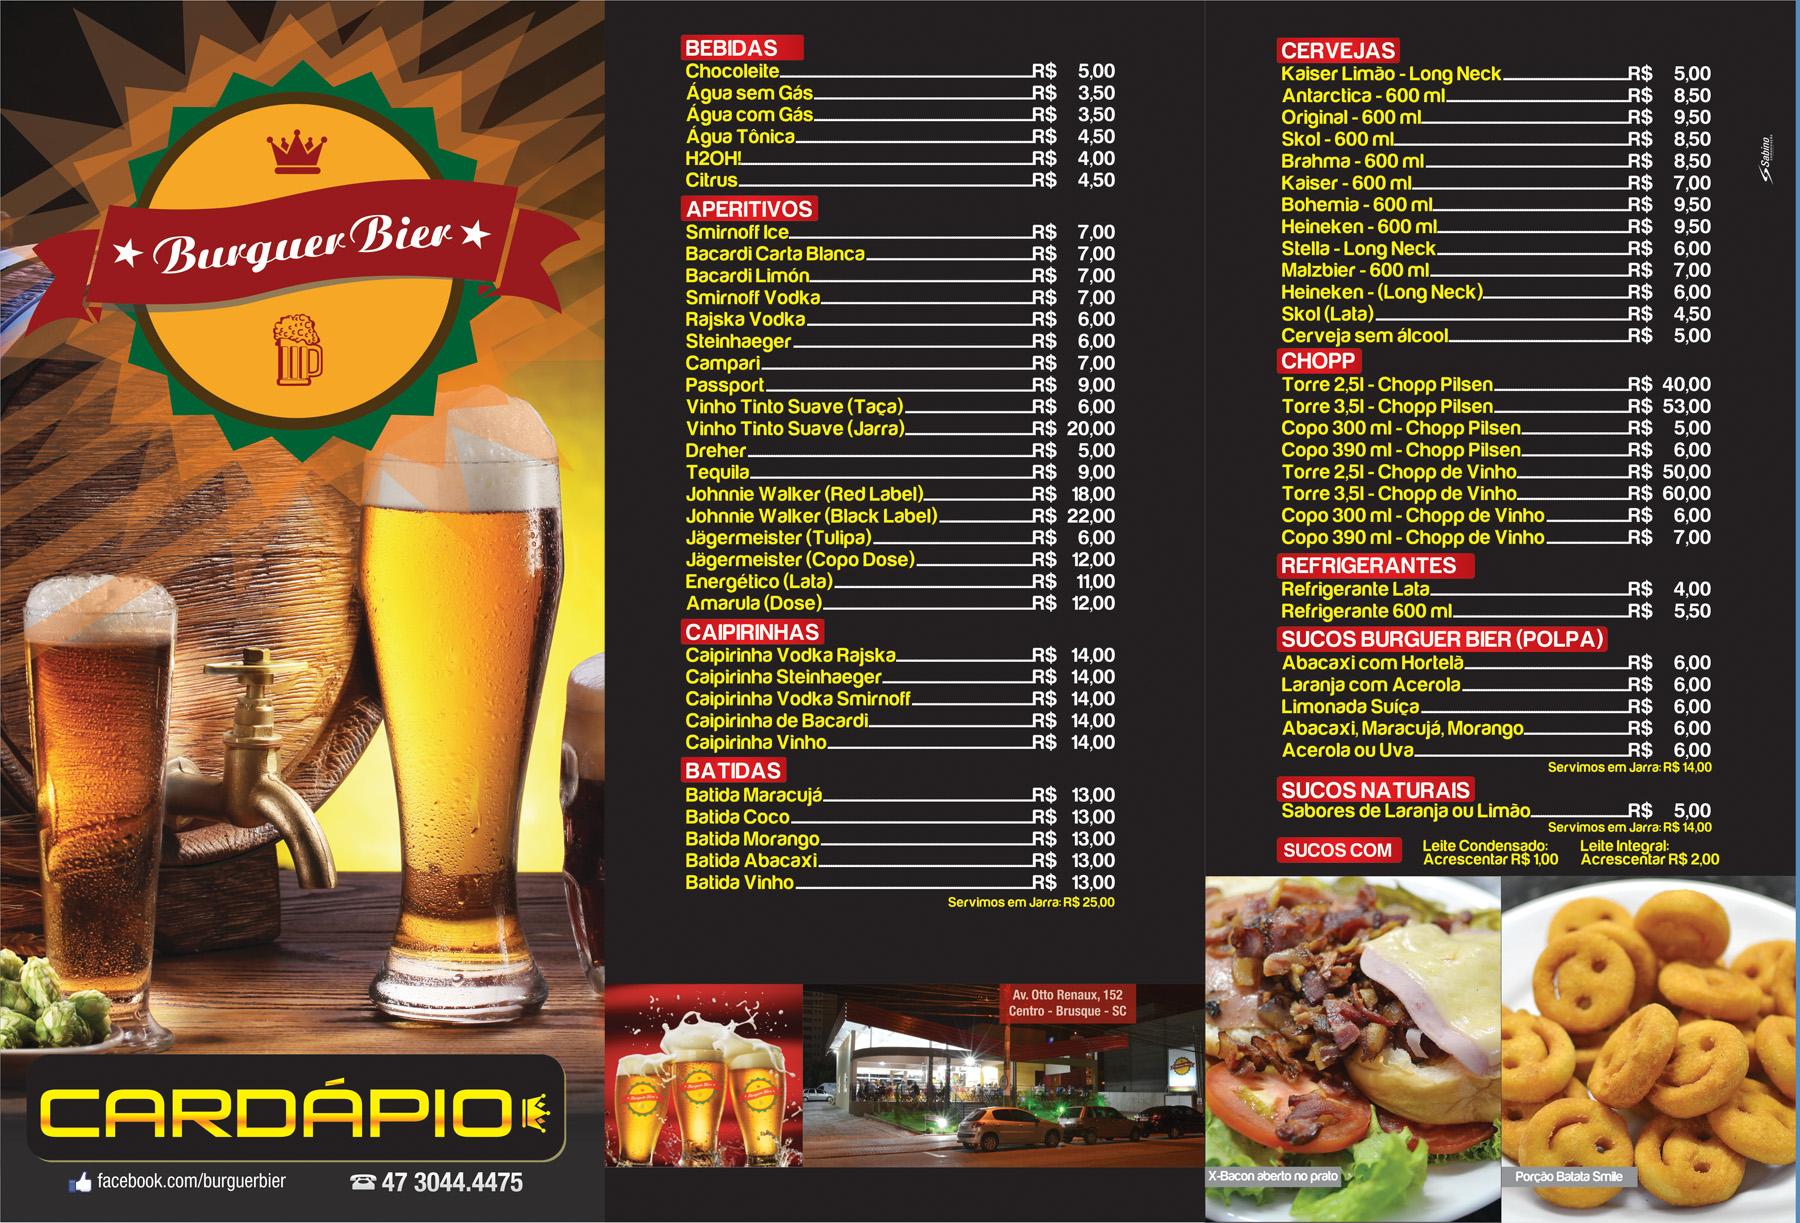 Cardápio Burguer Bier - Externo